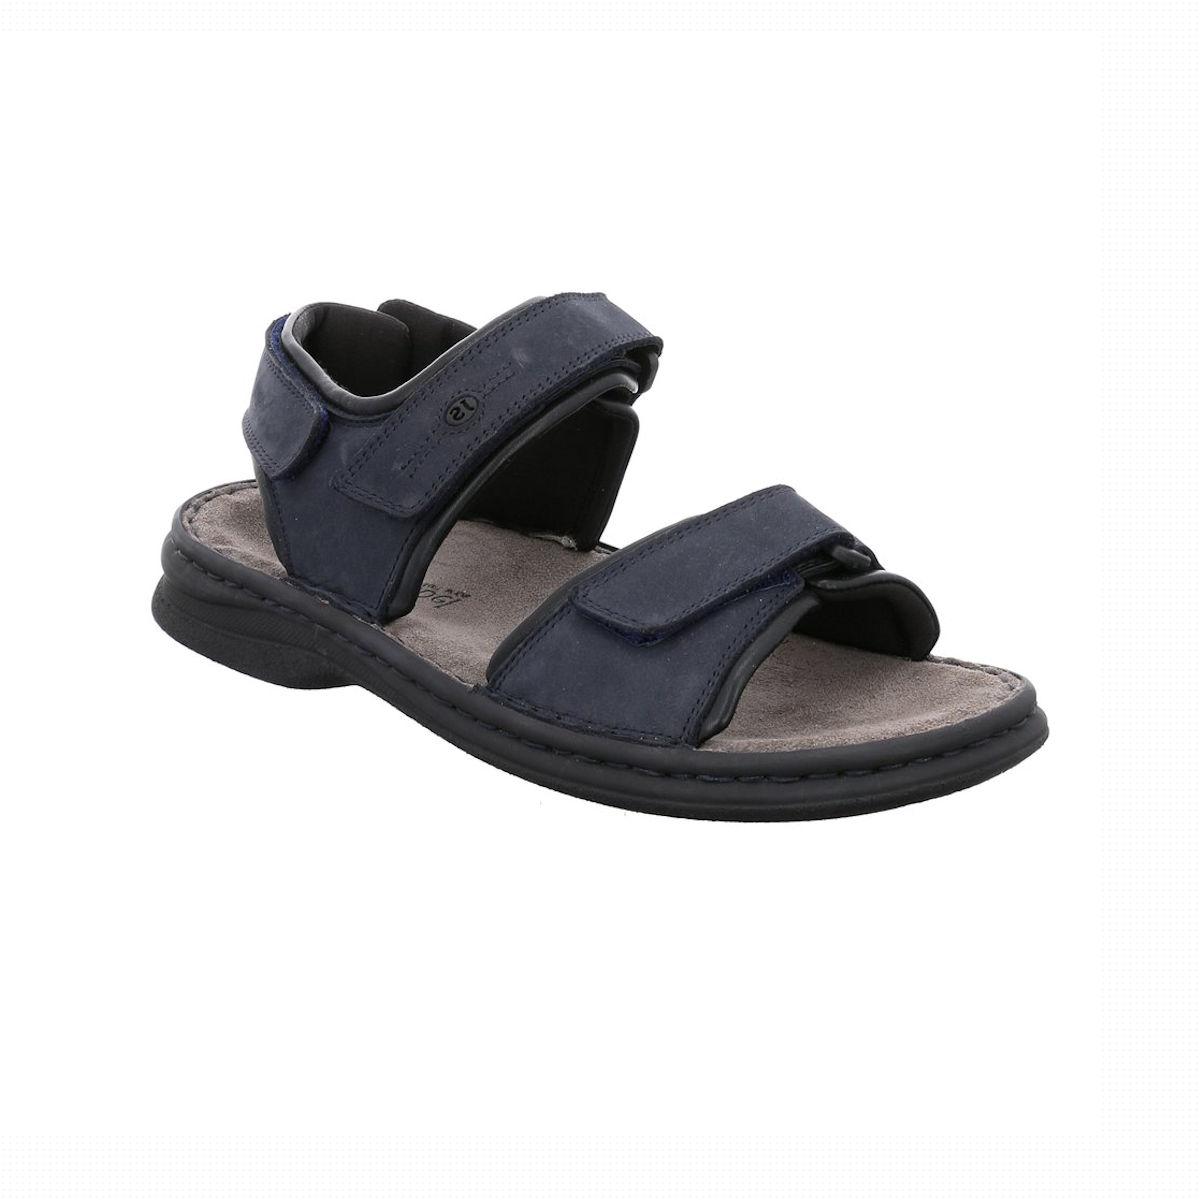 Josef Seibel Rafe - Mens Blue Sandal